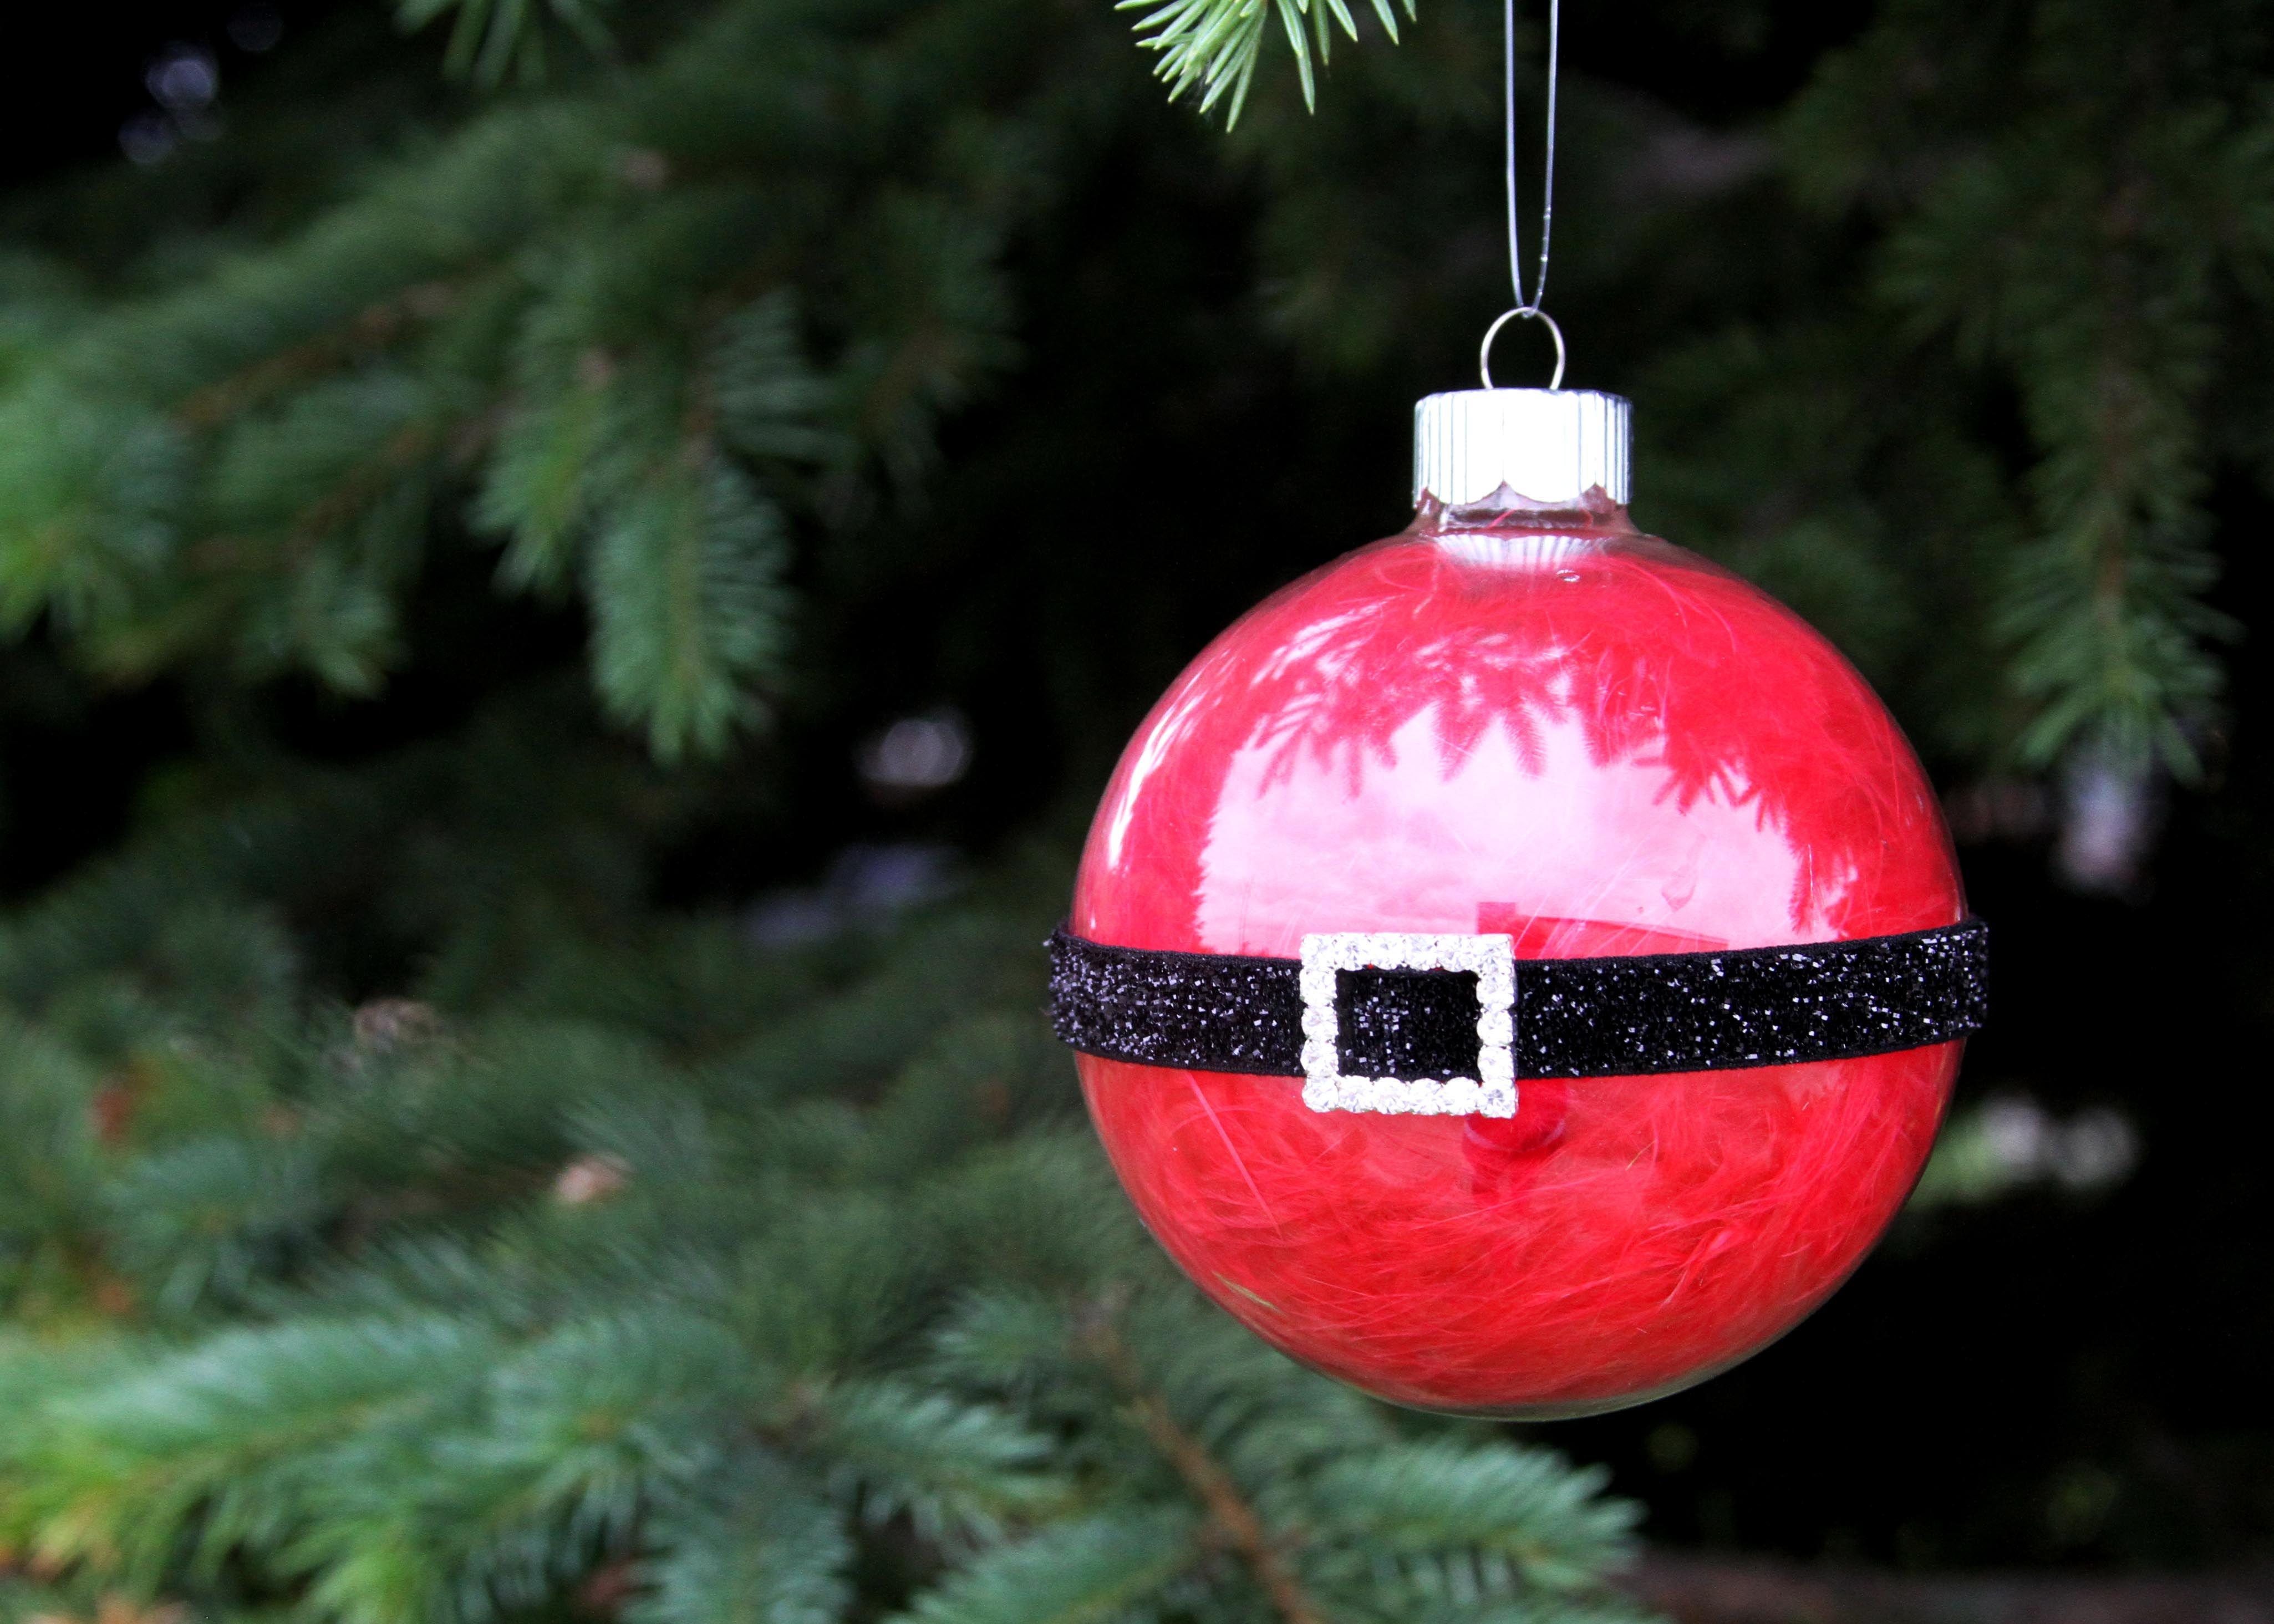 Homemade Christmas Ball Ornaments Ideas Google Search Christmas Crafts Decorations Christmas Diy Christmas Ornaments